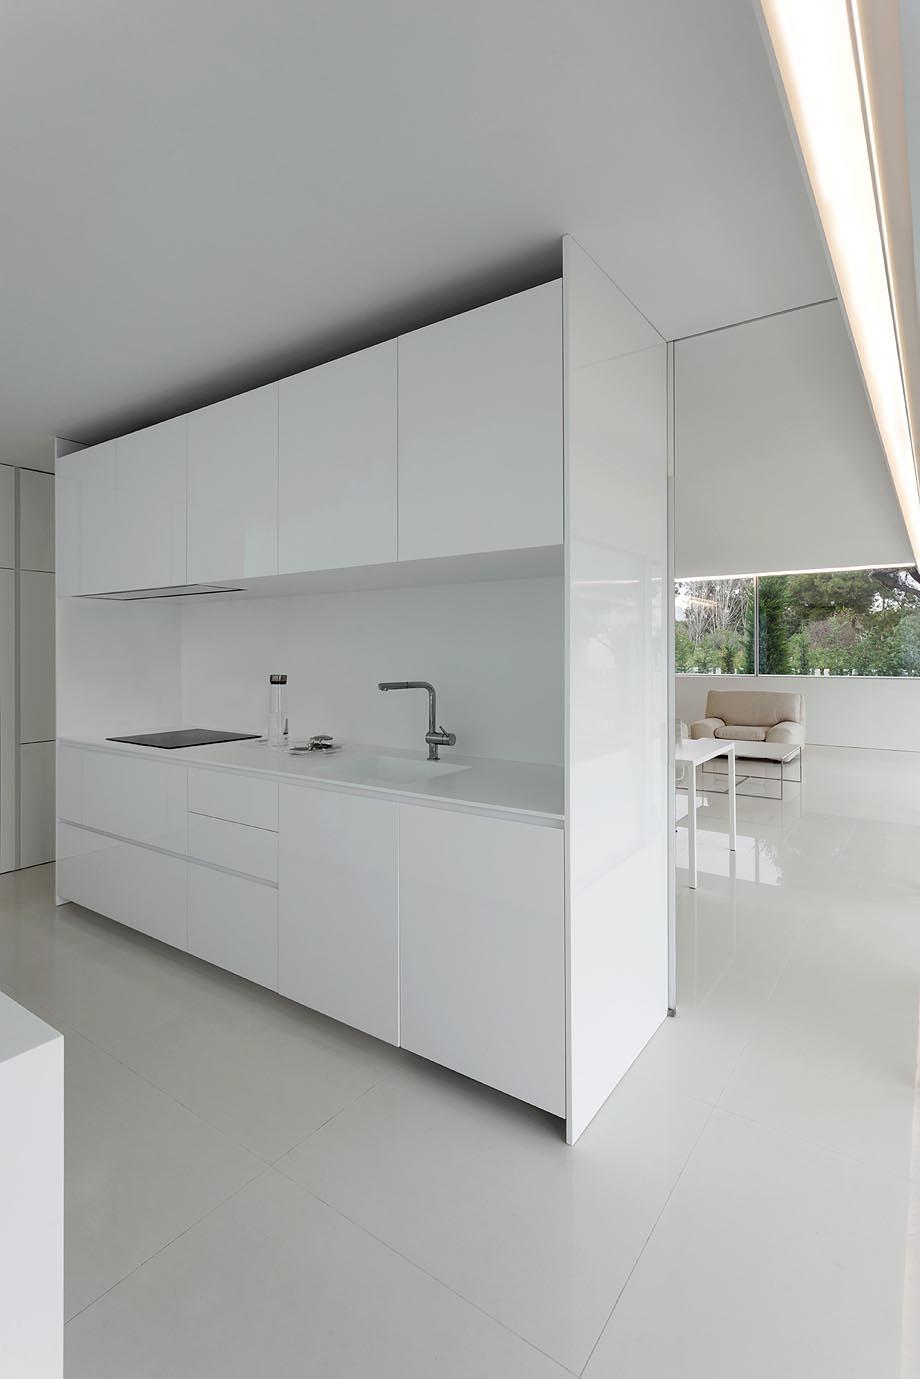 breeze house de fran silvestre arquitectos (10)